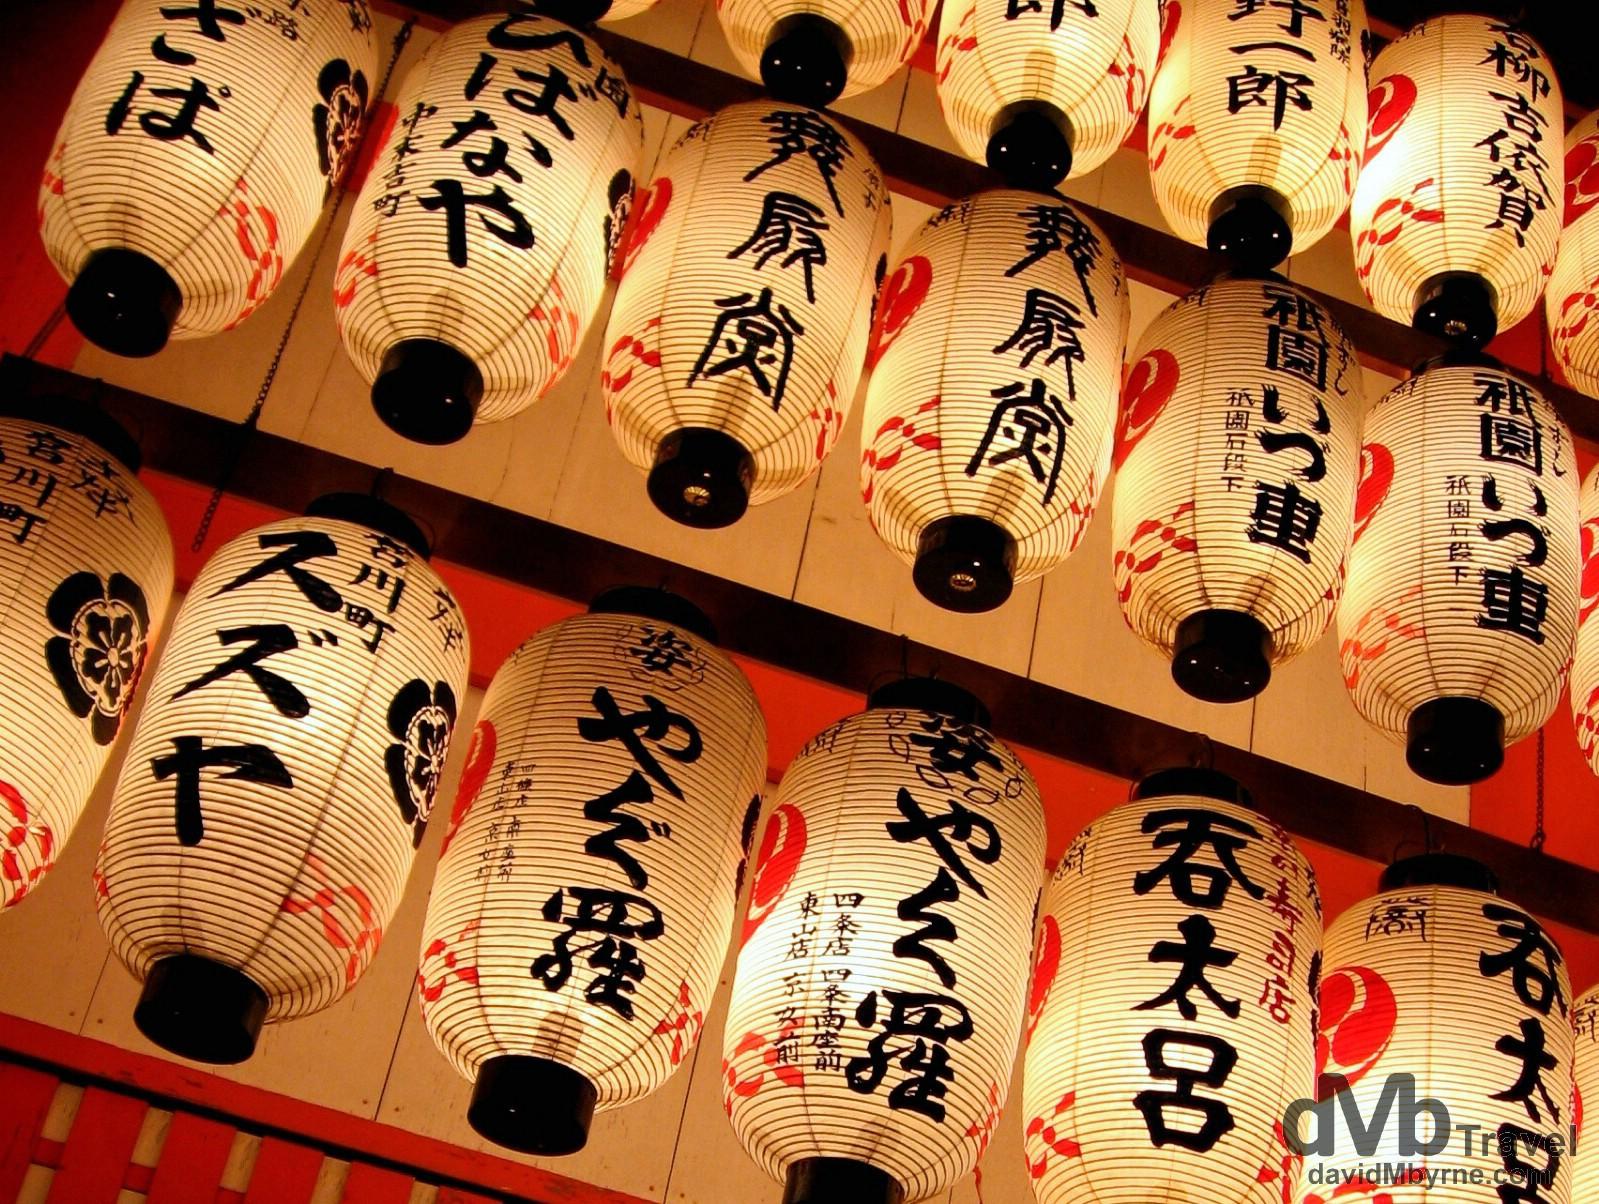 Lanterns adorn the stage of the Yasaka Jinja Shrine on the night of the Gion Matsuri festival in Kyoto, Honshu, Japan. July 17th, 2005.